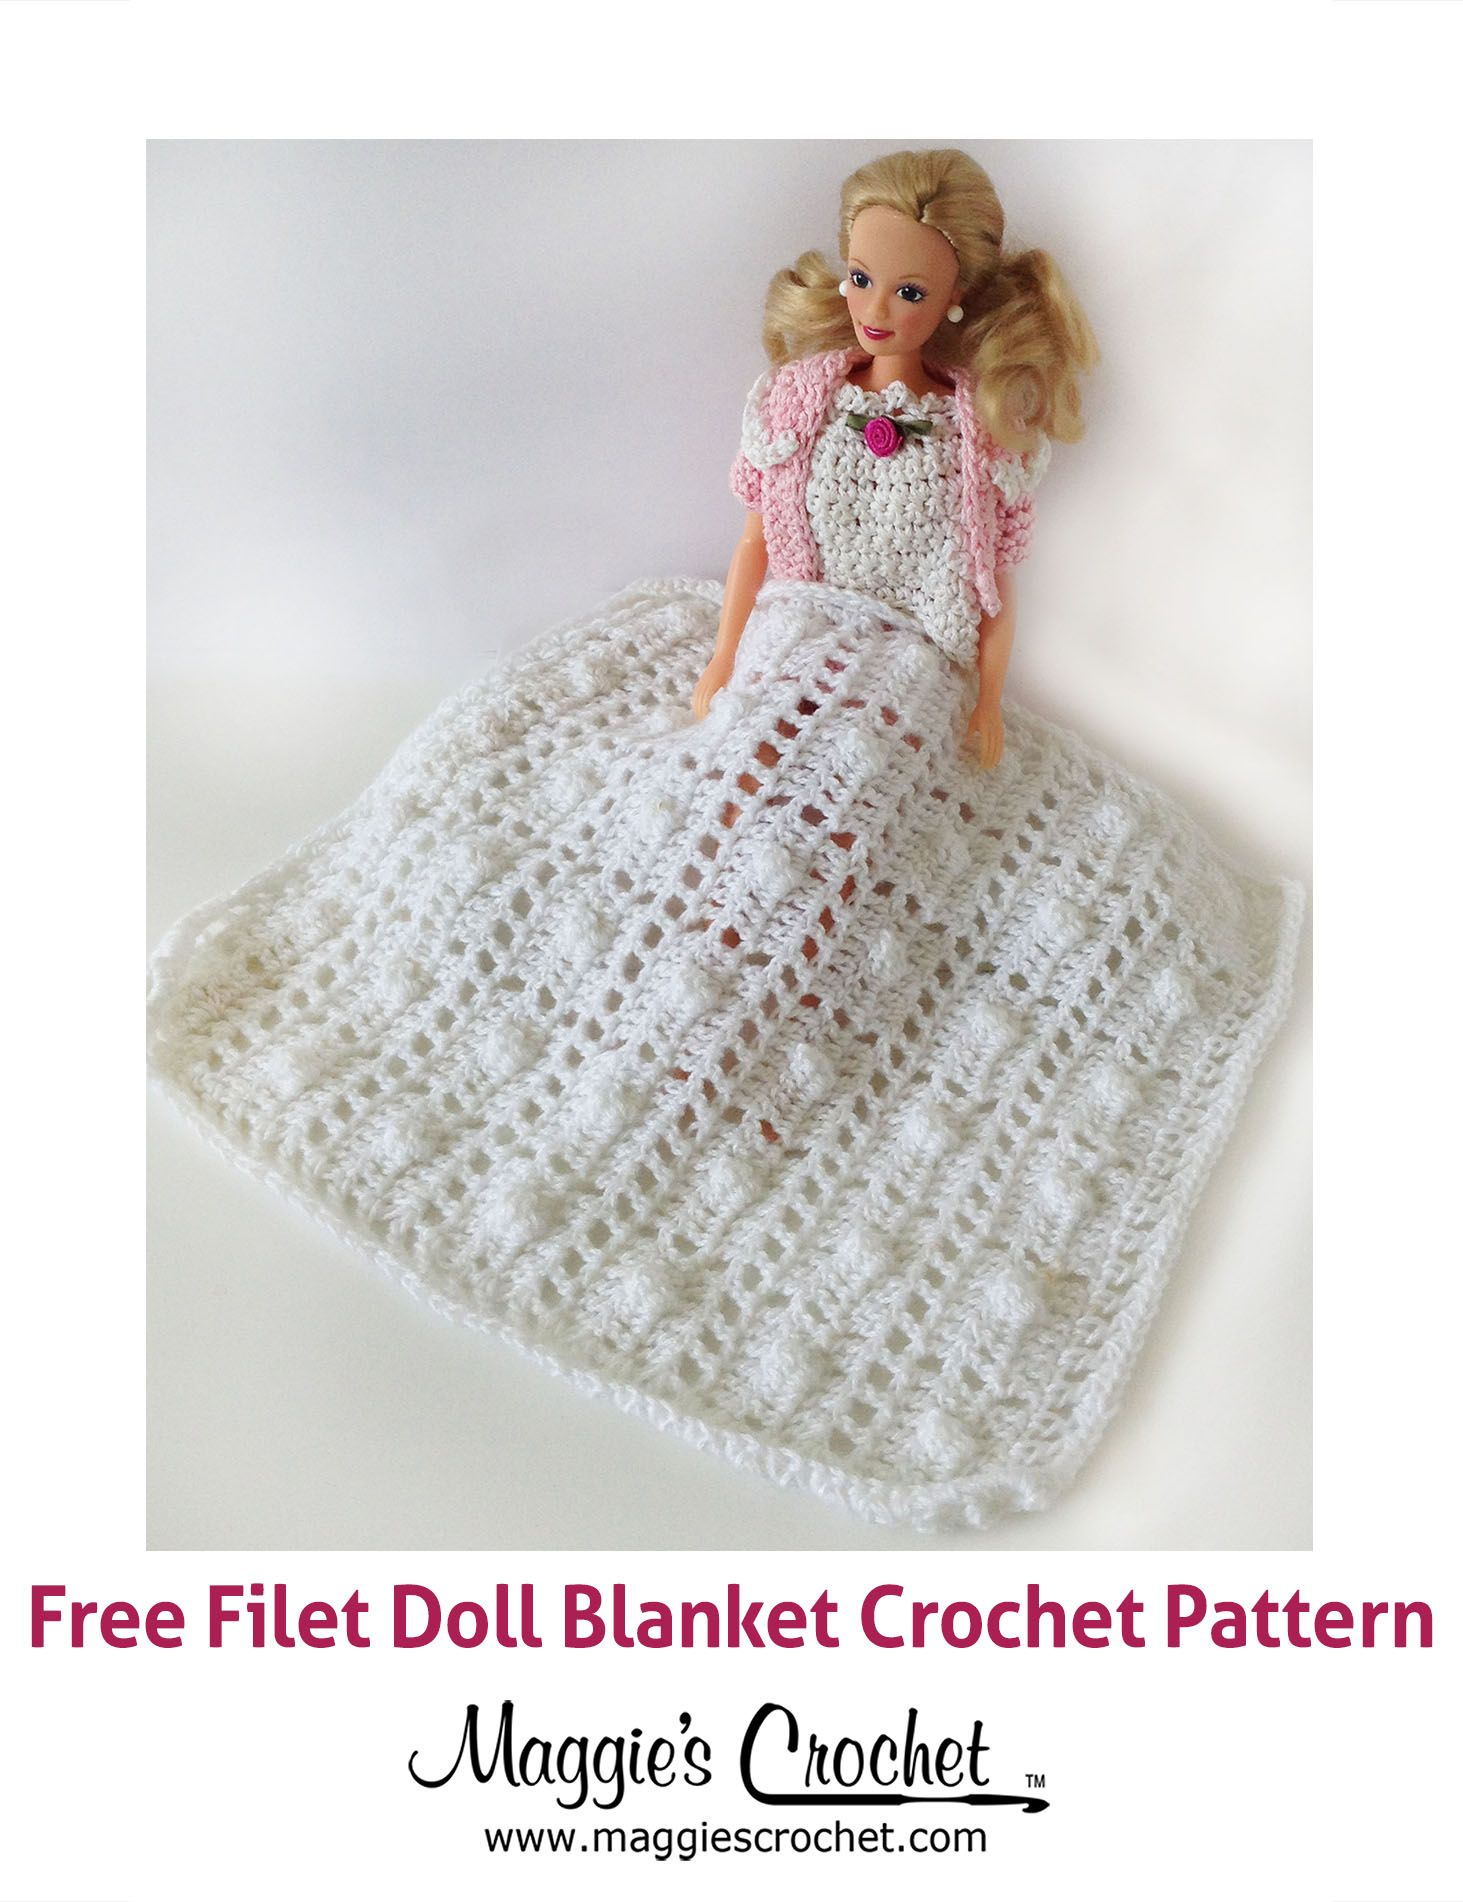 Baby Doll Filet Afghan Free Crochet Pattern From Maggies Crochet